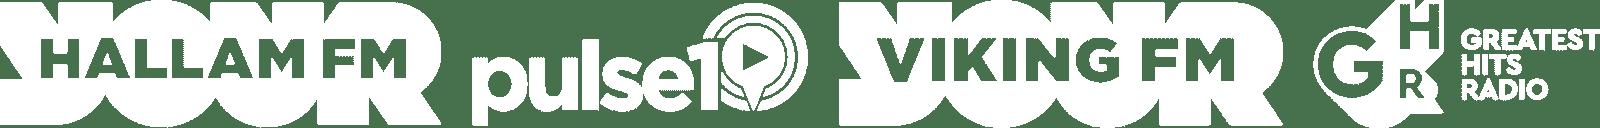 Hallam FM, Pulse FM, Viking FM, Greatest Hits Radio